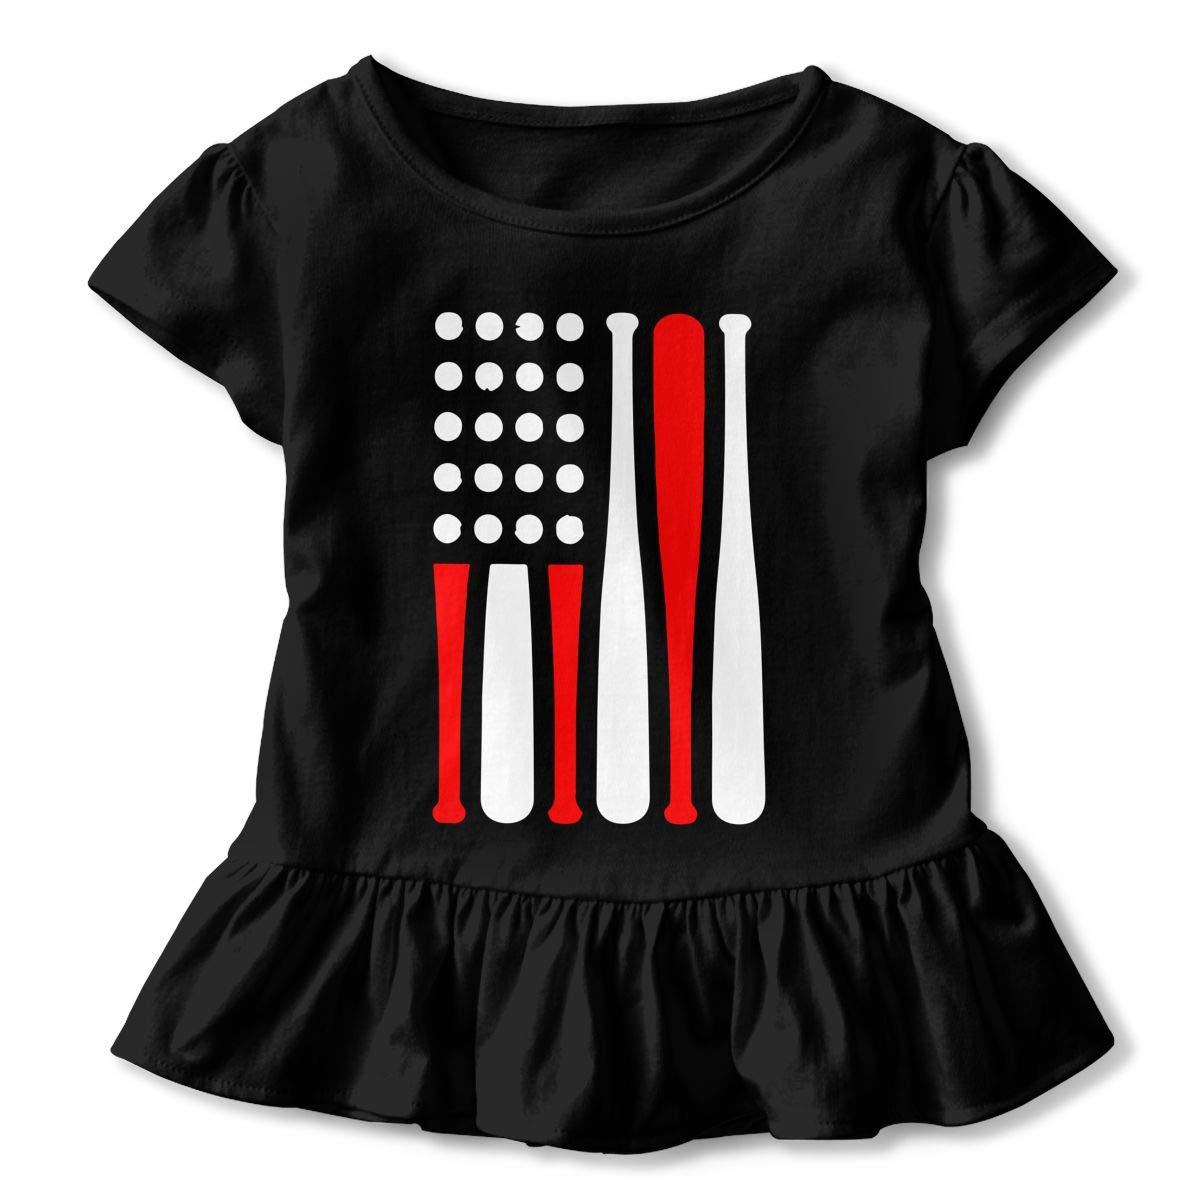 Baseball American USA Flag Kids Girls Short Sleeve T-Shirts Ruffles Shirt Tee for 2-6T